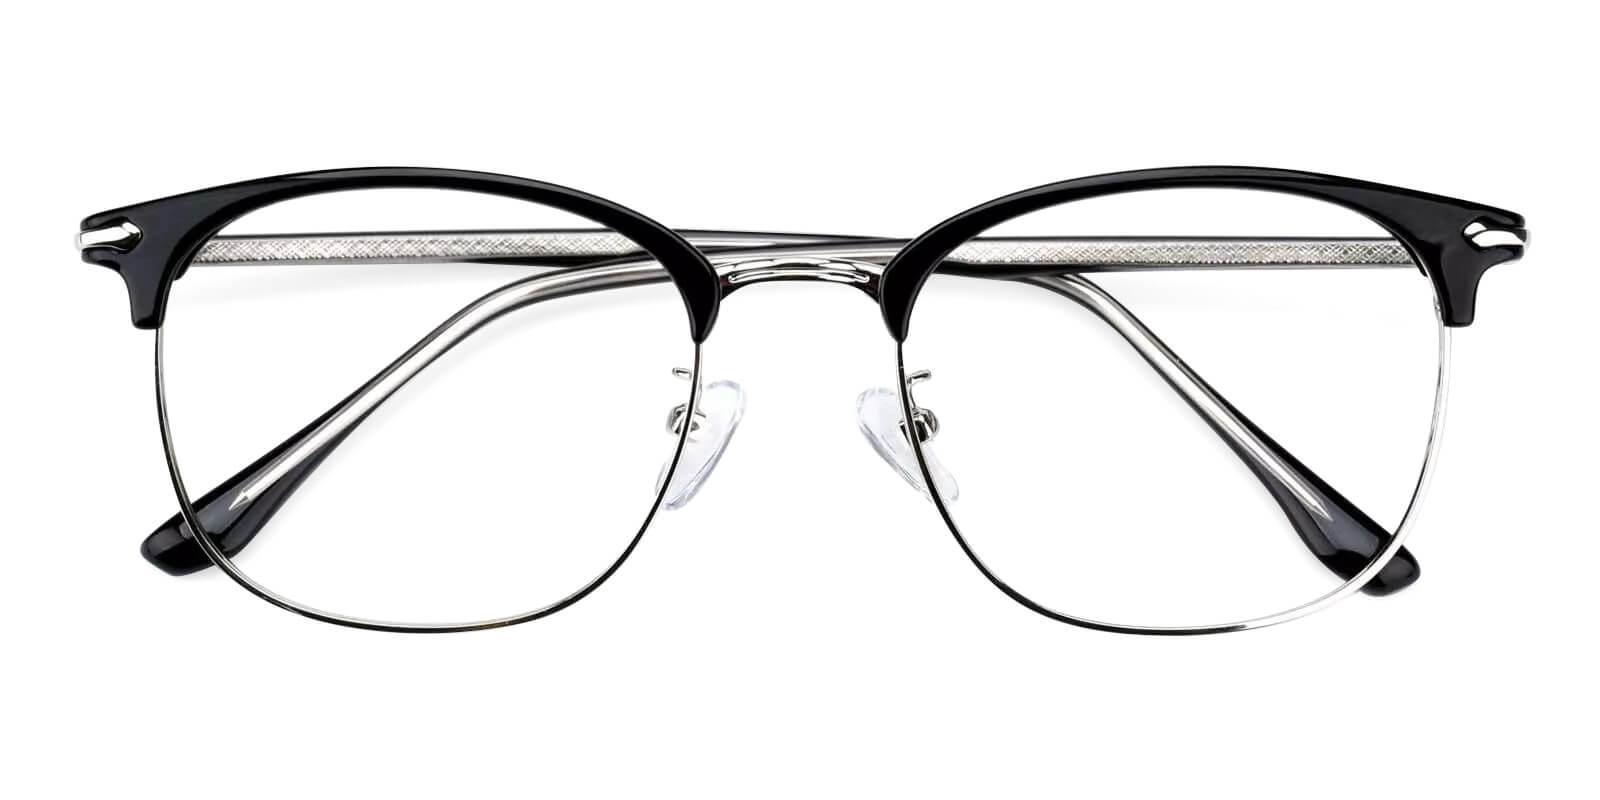 Tristan Black Metal Eyeglasses , Fashion , NosePads Frames from ABBE Glasses